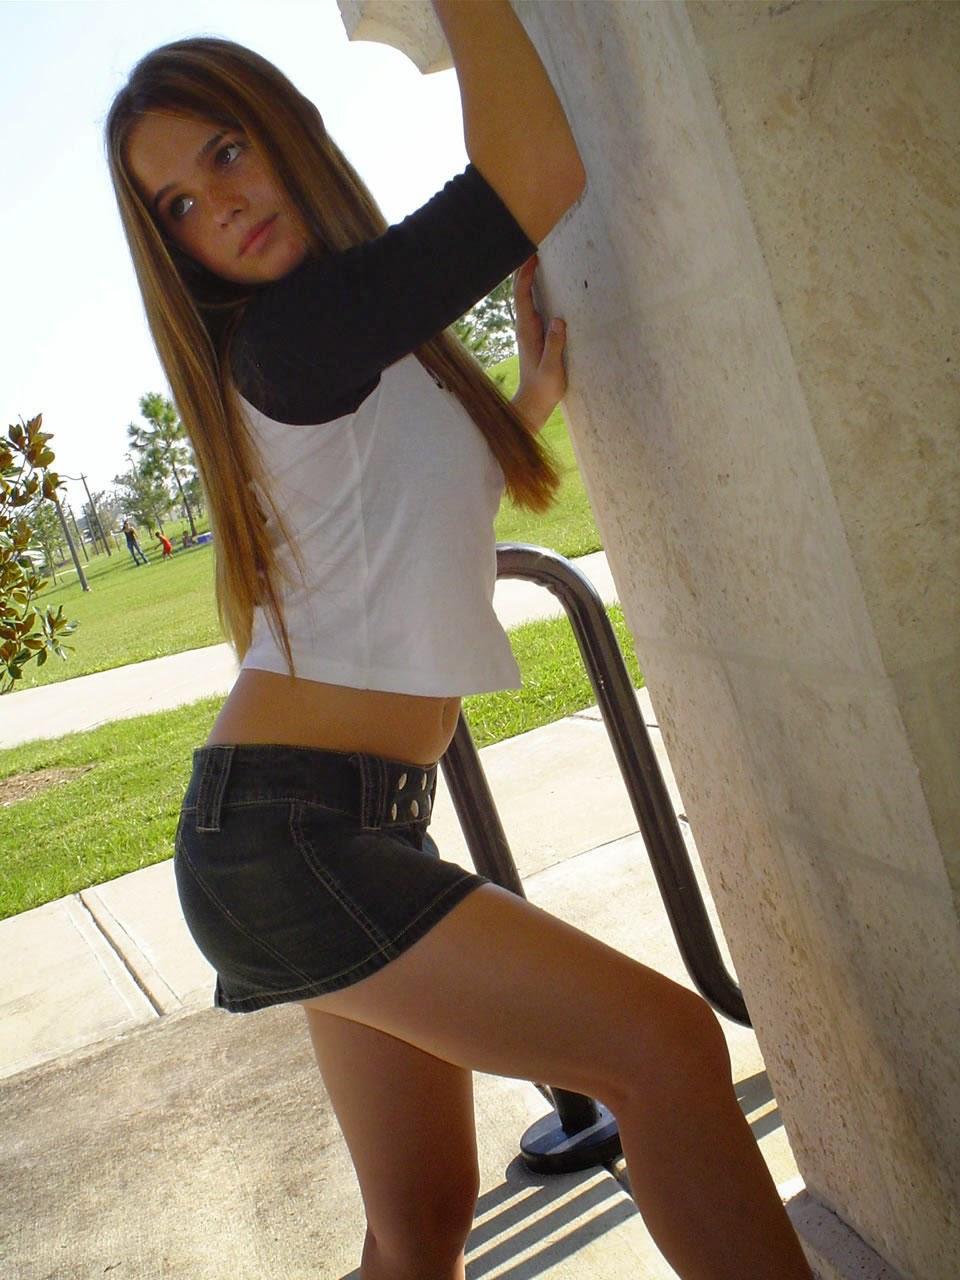 Belinda mnn teen model think, that